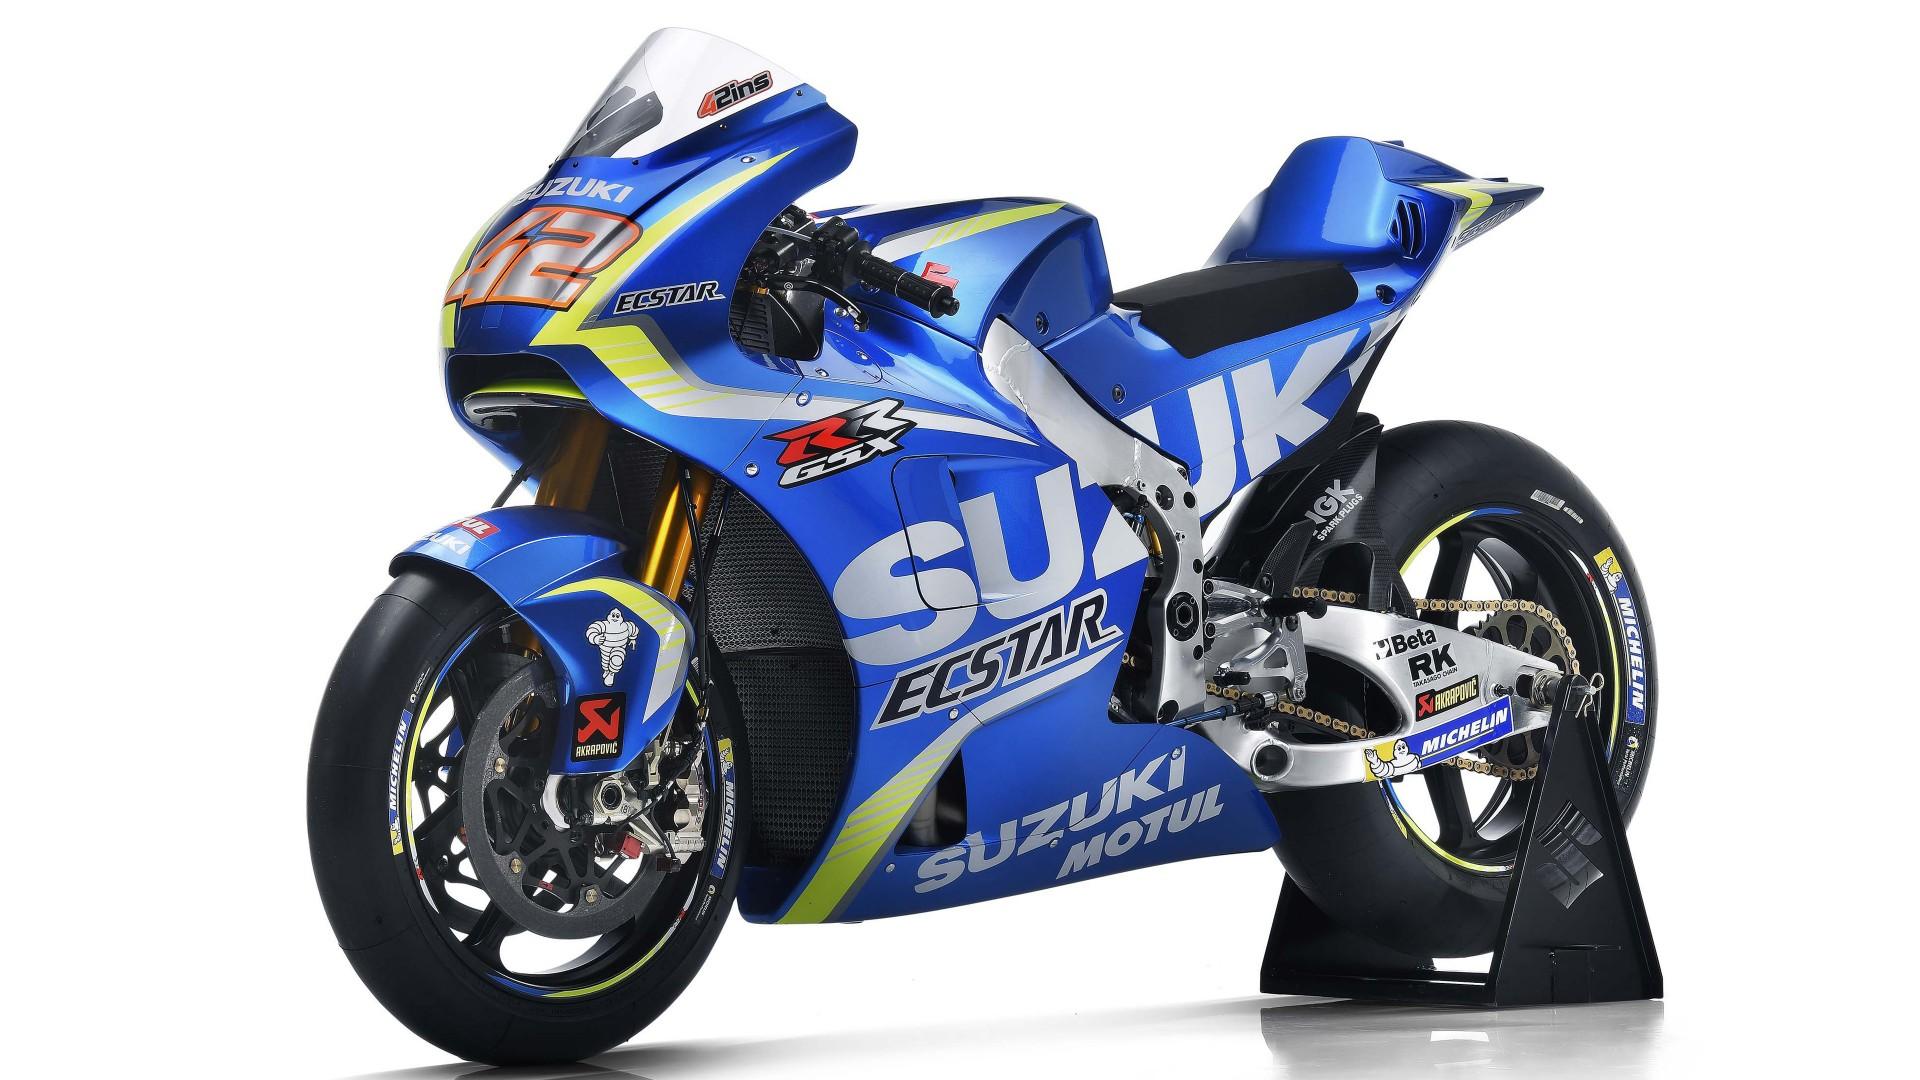 Hd Motorcycle Wallpaper Widescreen 2017 Ecstar Suzuki Team Motogp Bike Wallpapers Hd